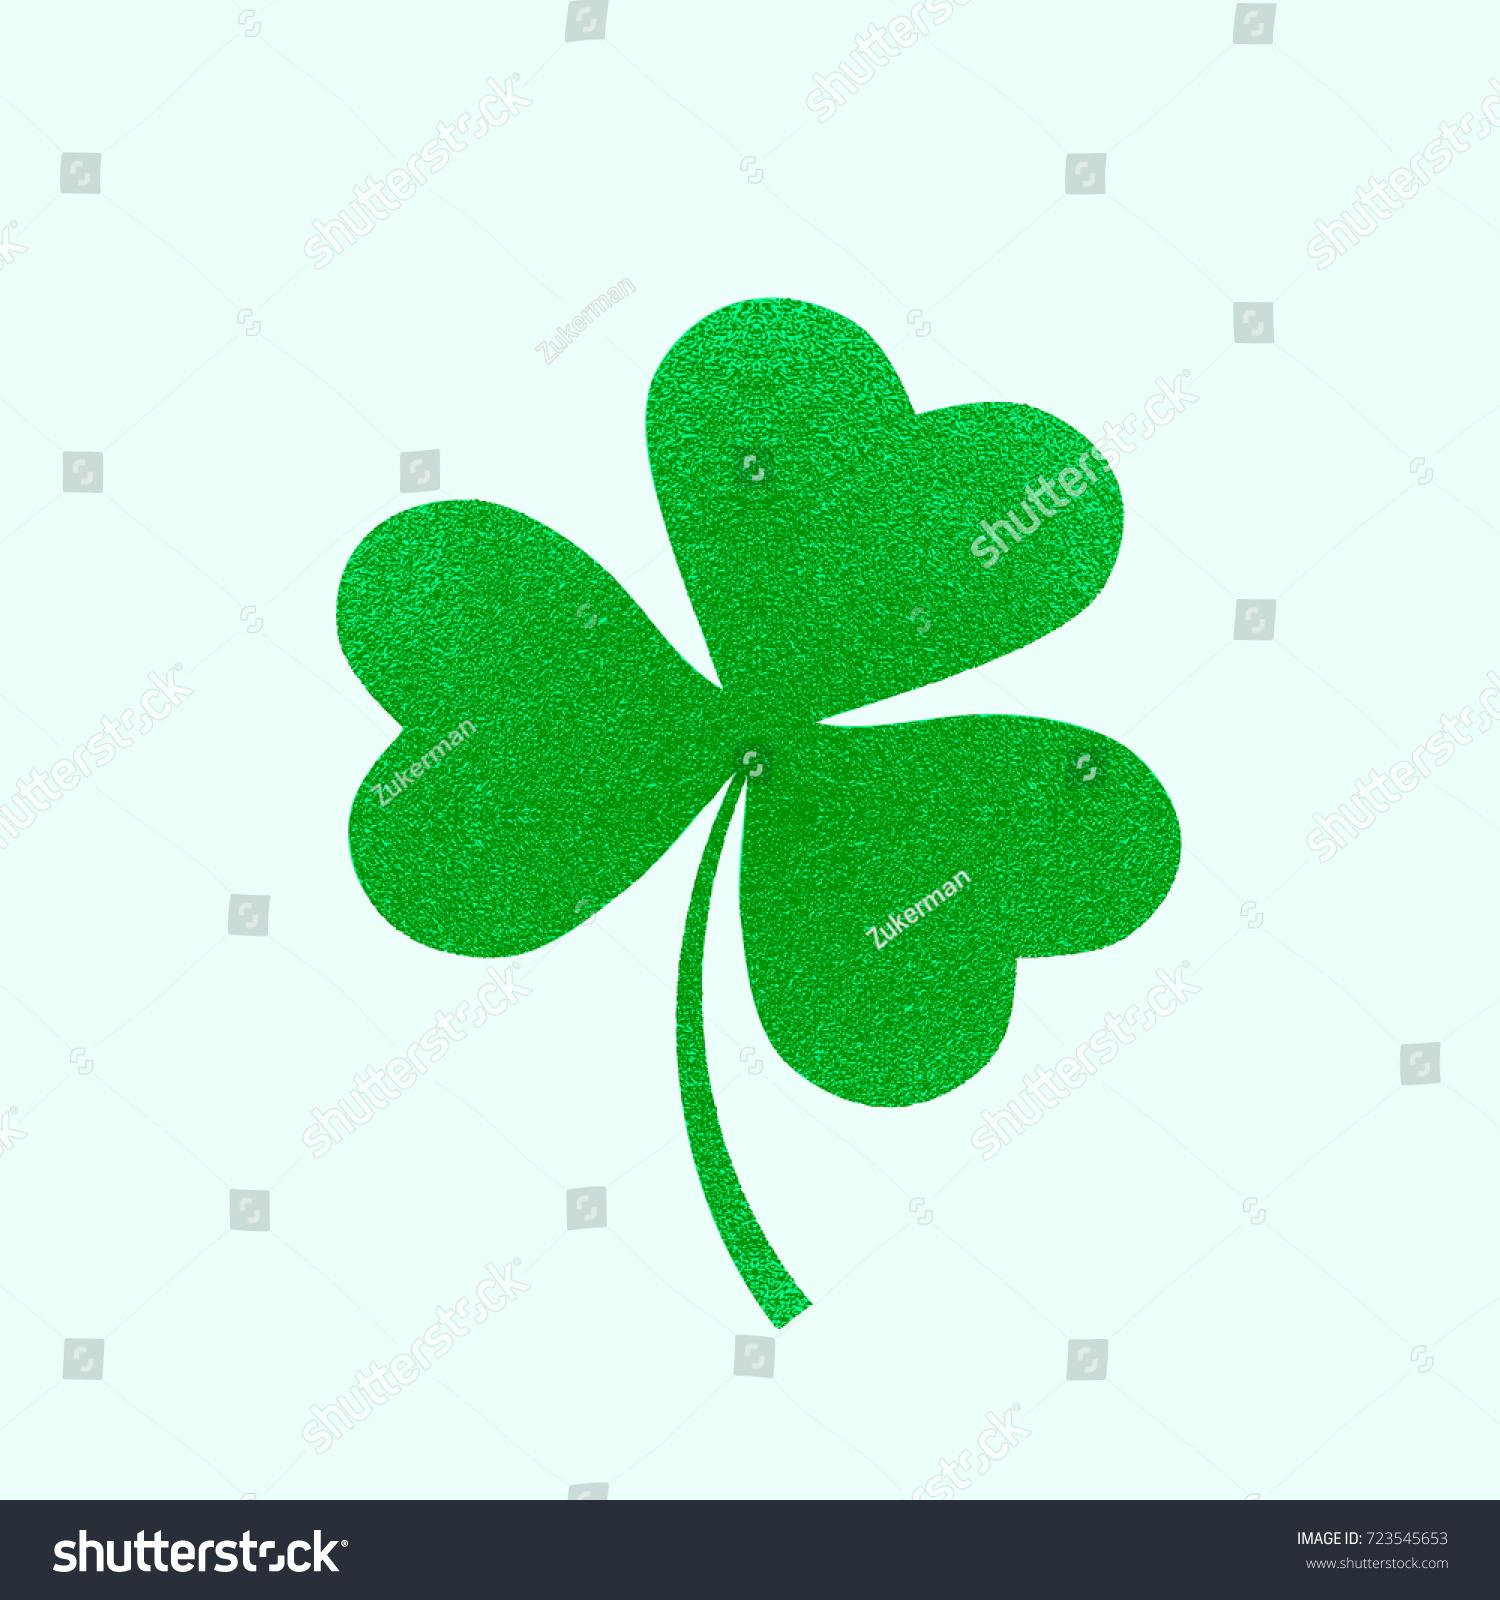 irish holiday saint patricks day leaves stock vector 723545653